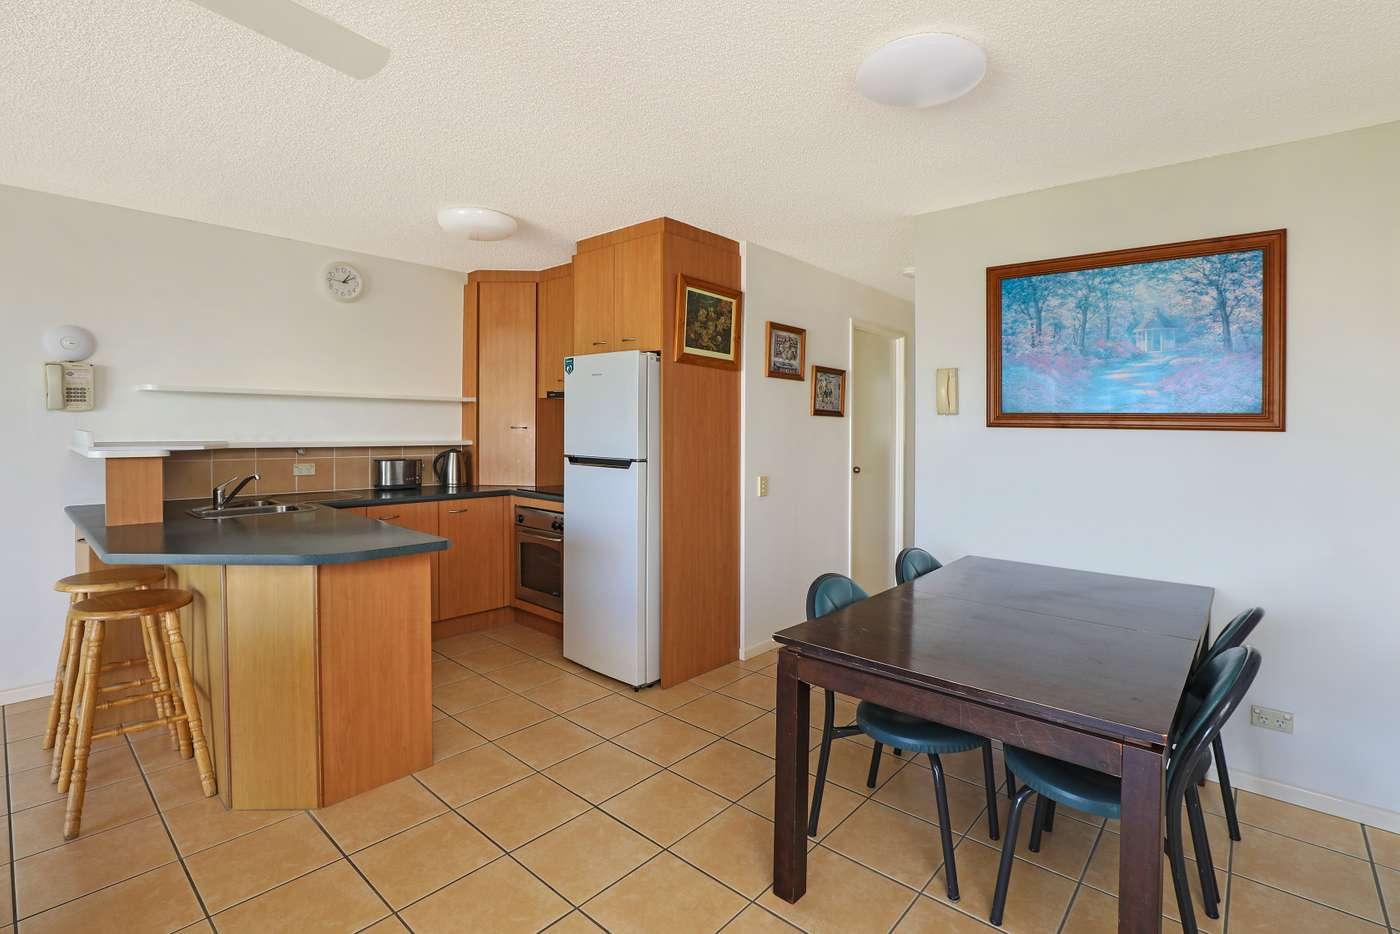 Seventh view of Homely apartment listing, 15/18 Mahia Terrace, Kings Beach QLD 4551